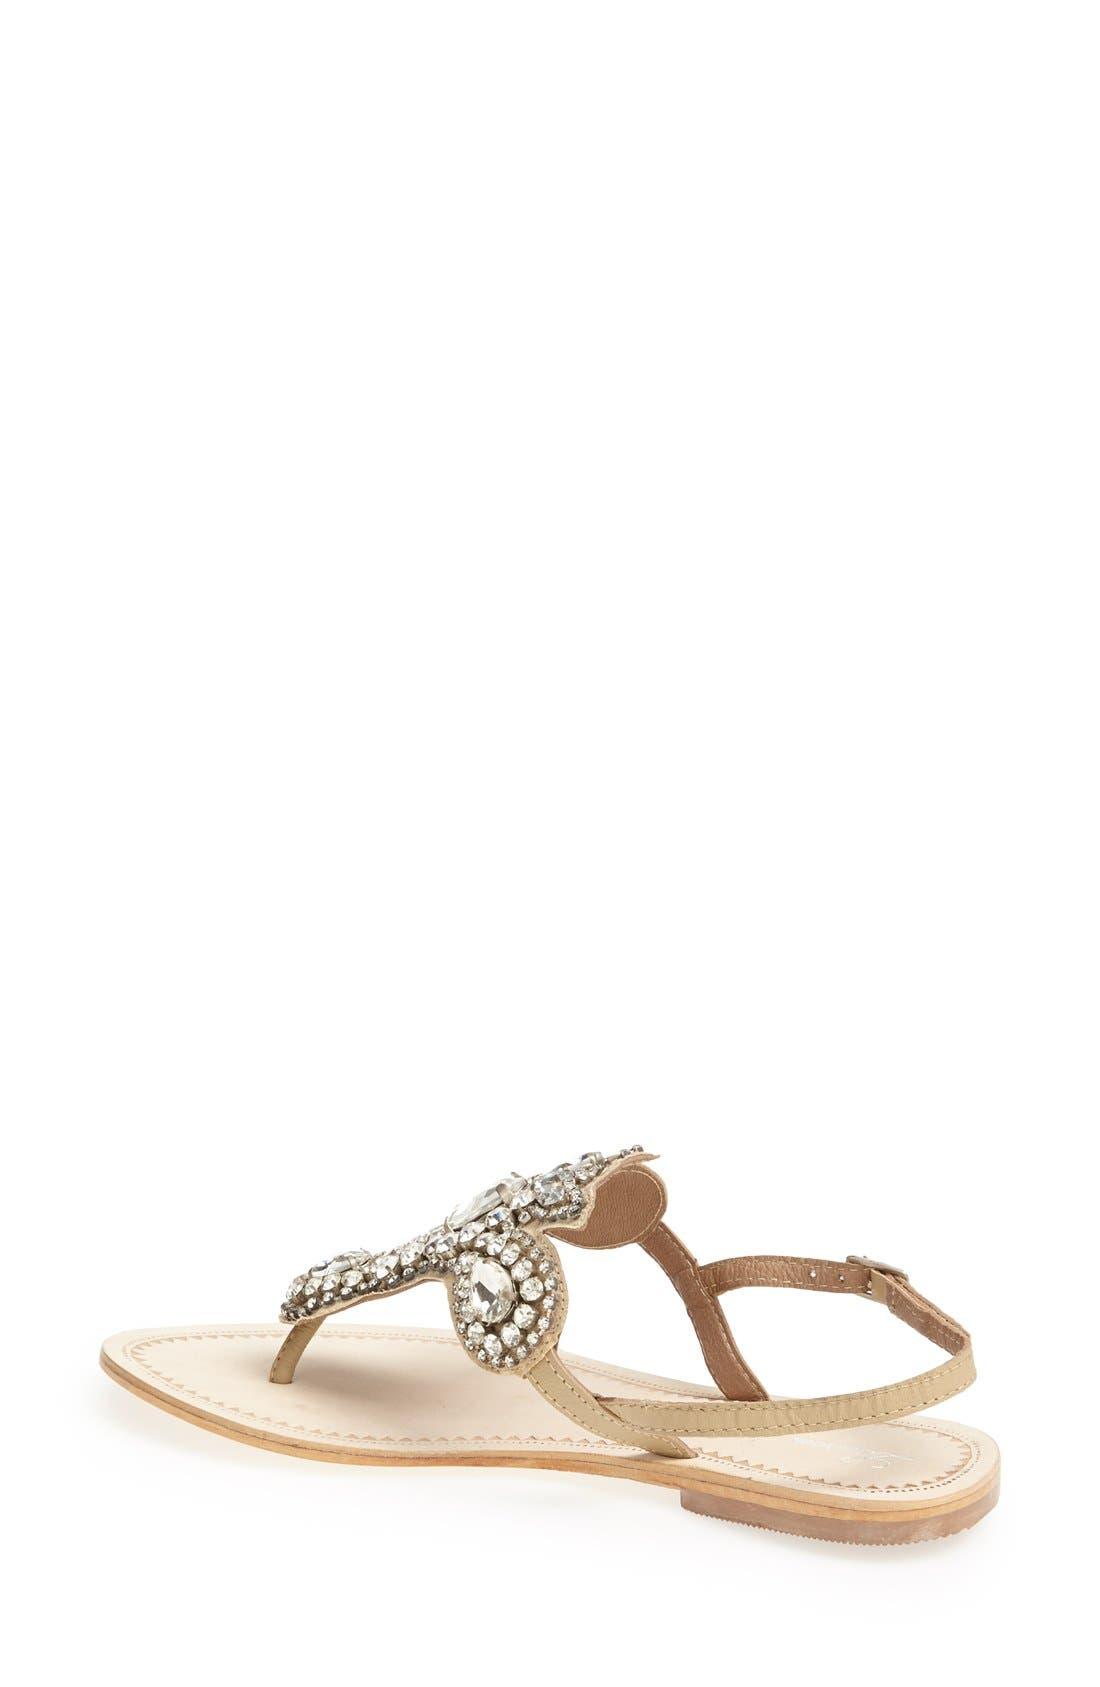 Alternate Image 2  - Lauren Lorraine 'Ibiza' Crystal Thong Sandal (Women)